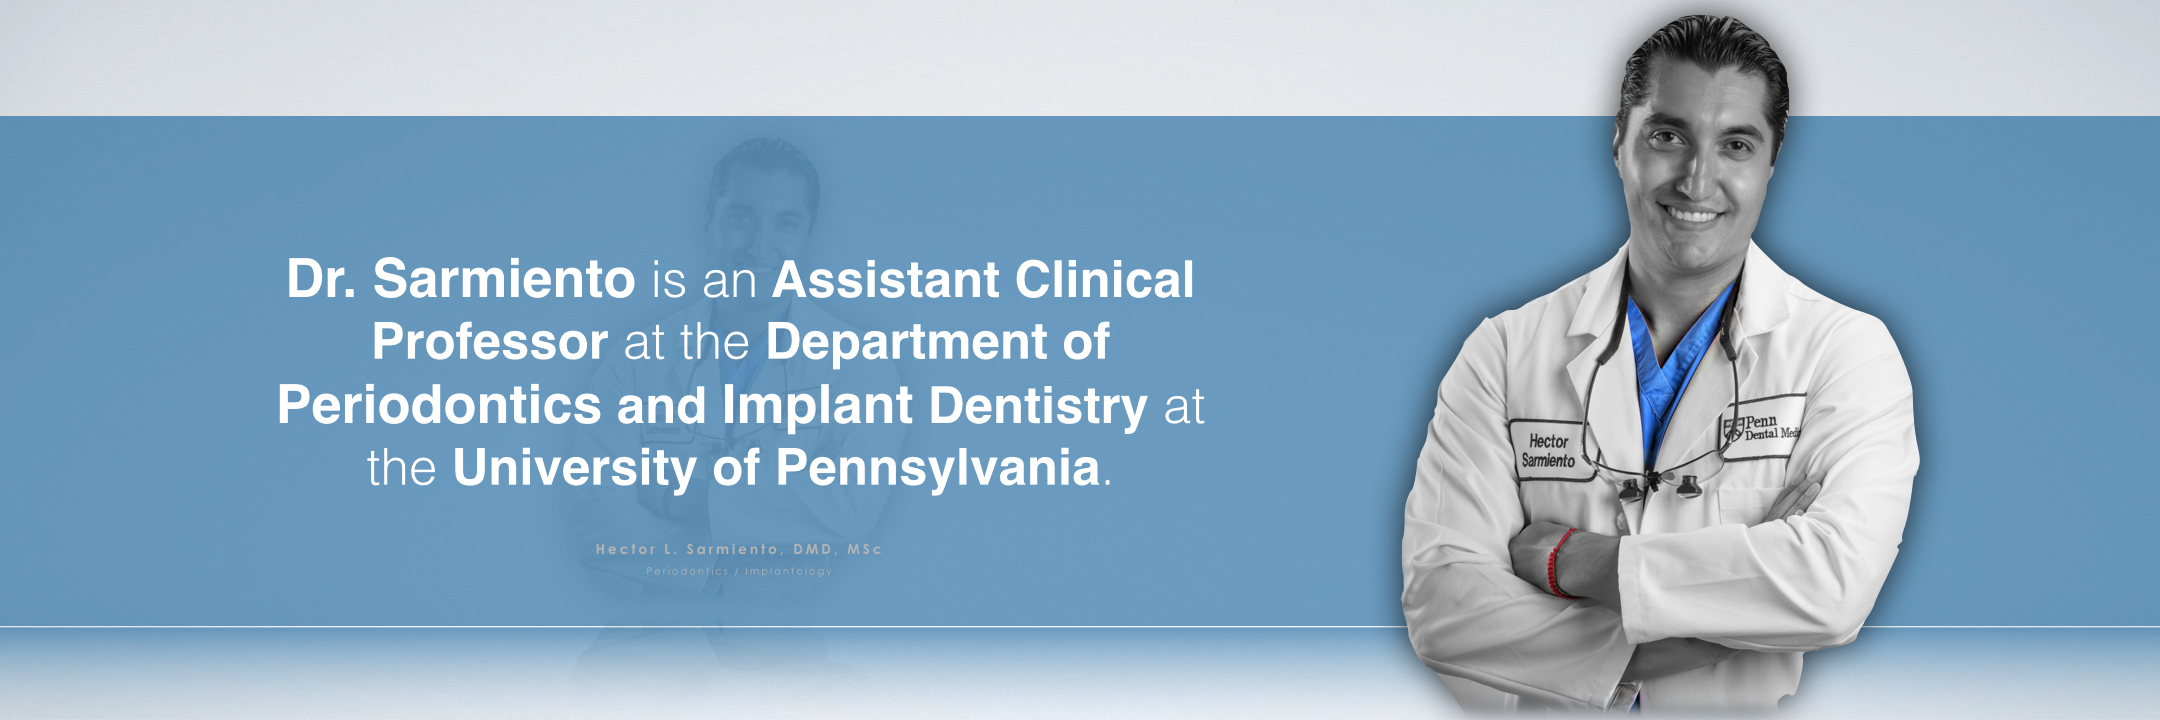 Dr.-Hector-Sarmiento-Banner-Best-Periodontist.1